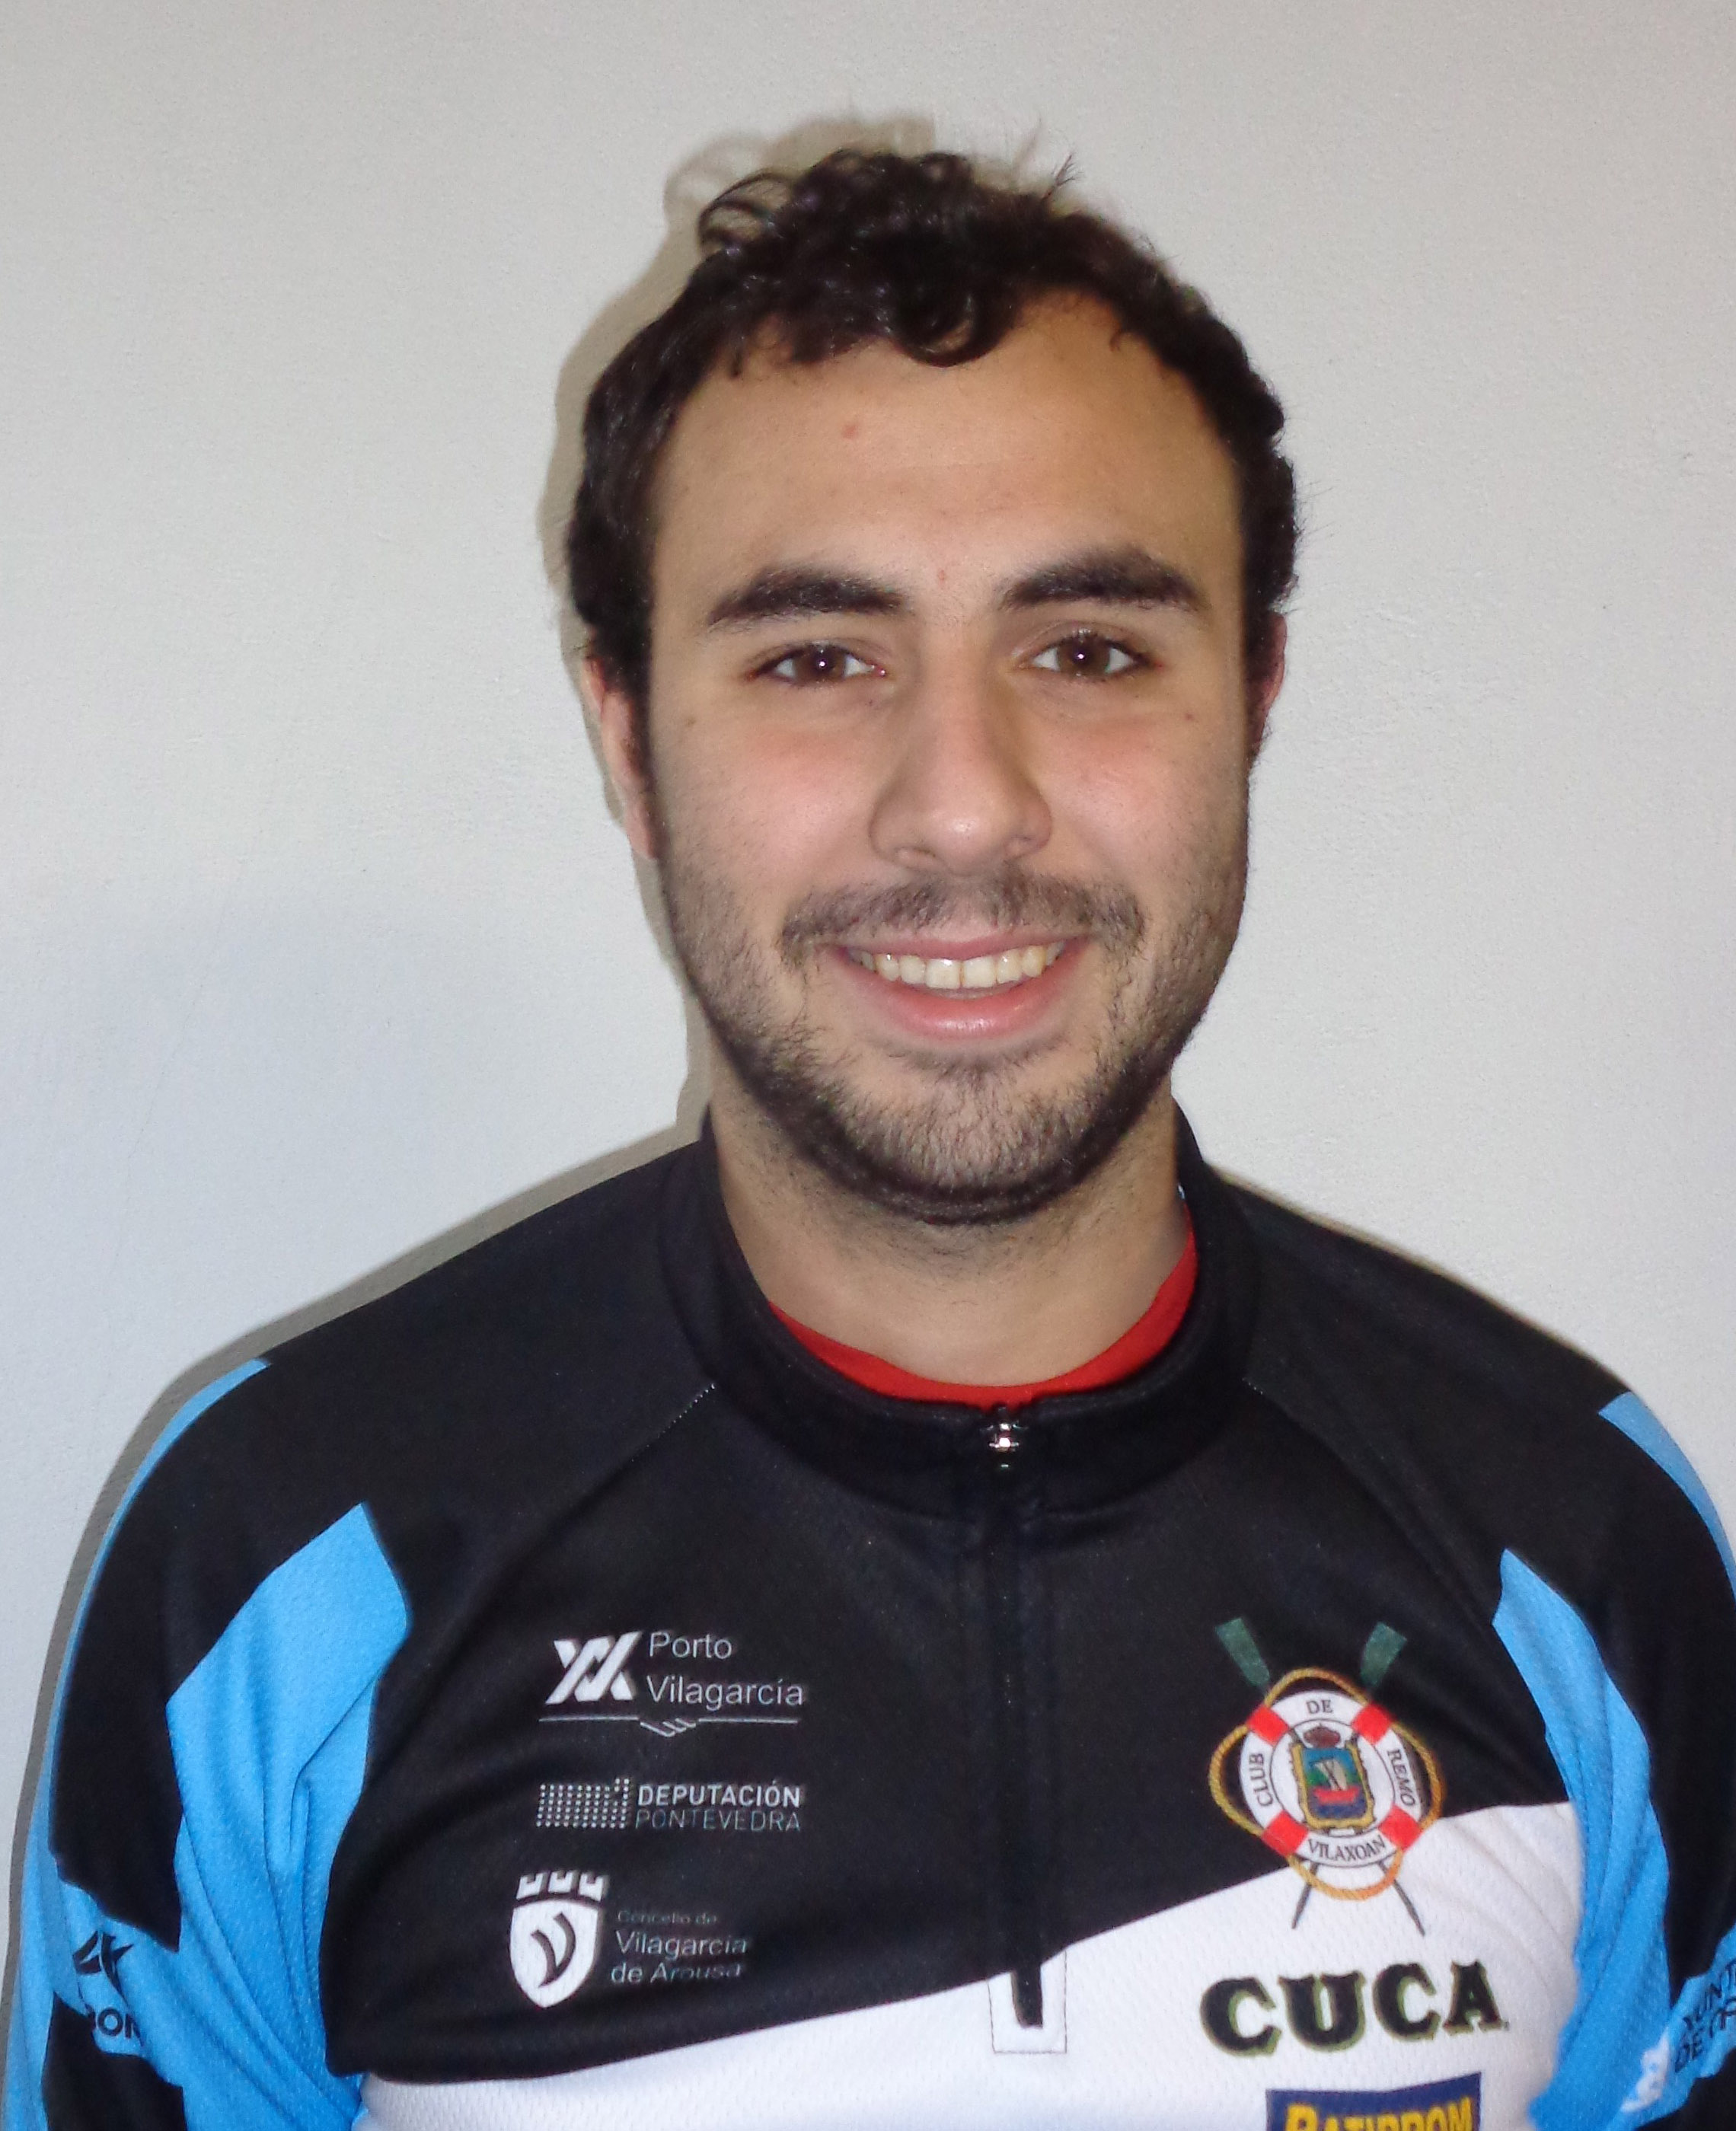 Roberto Fdez. - PROPIO